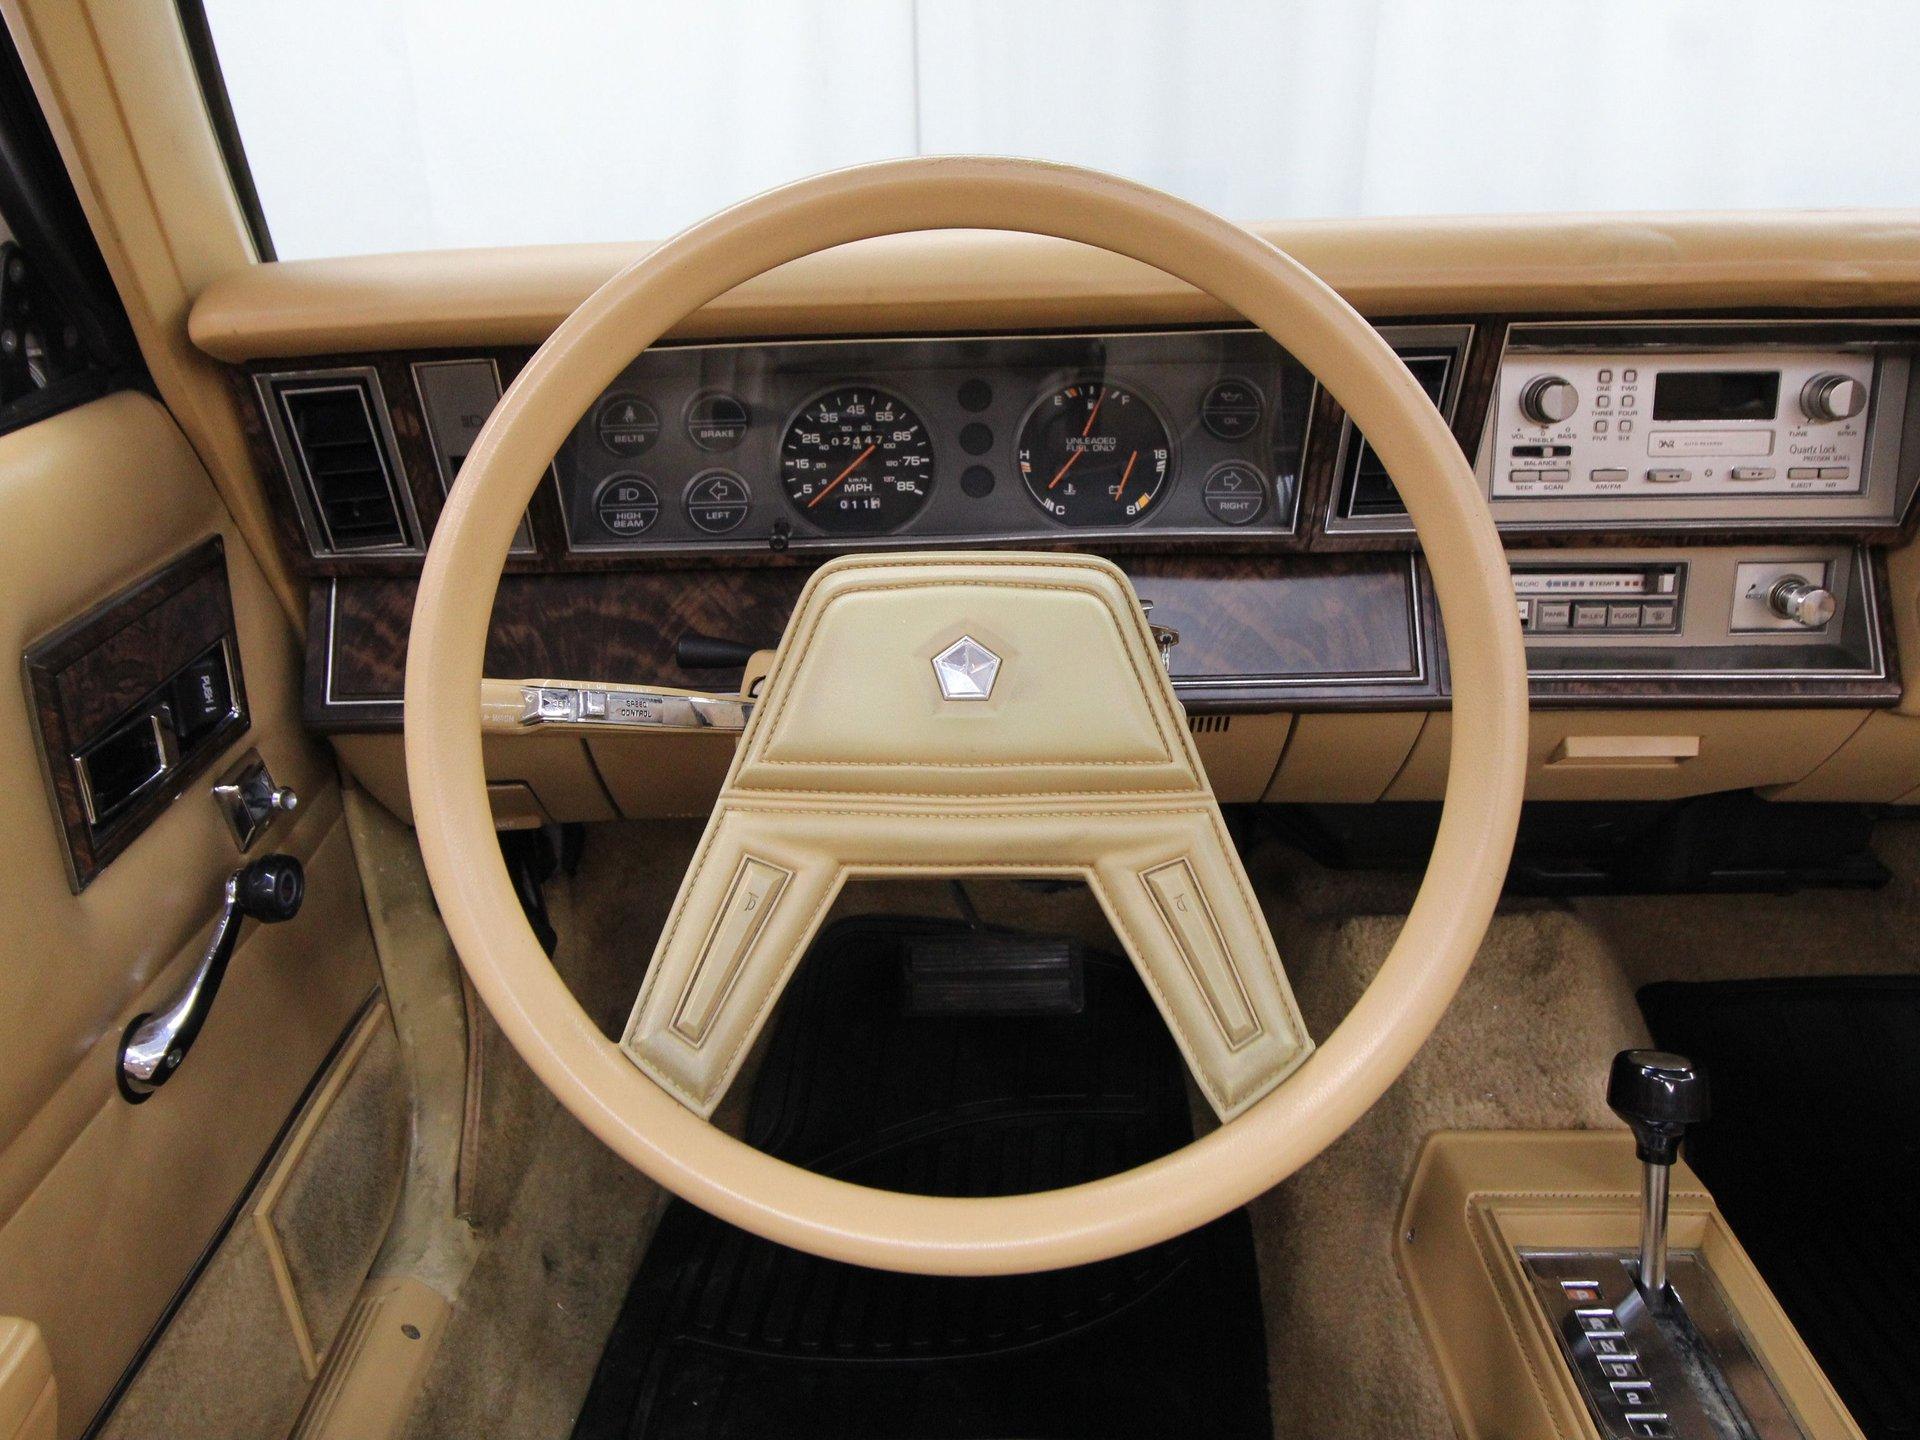 1986 Chrysler LeBaron